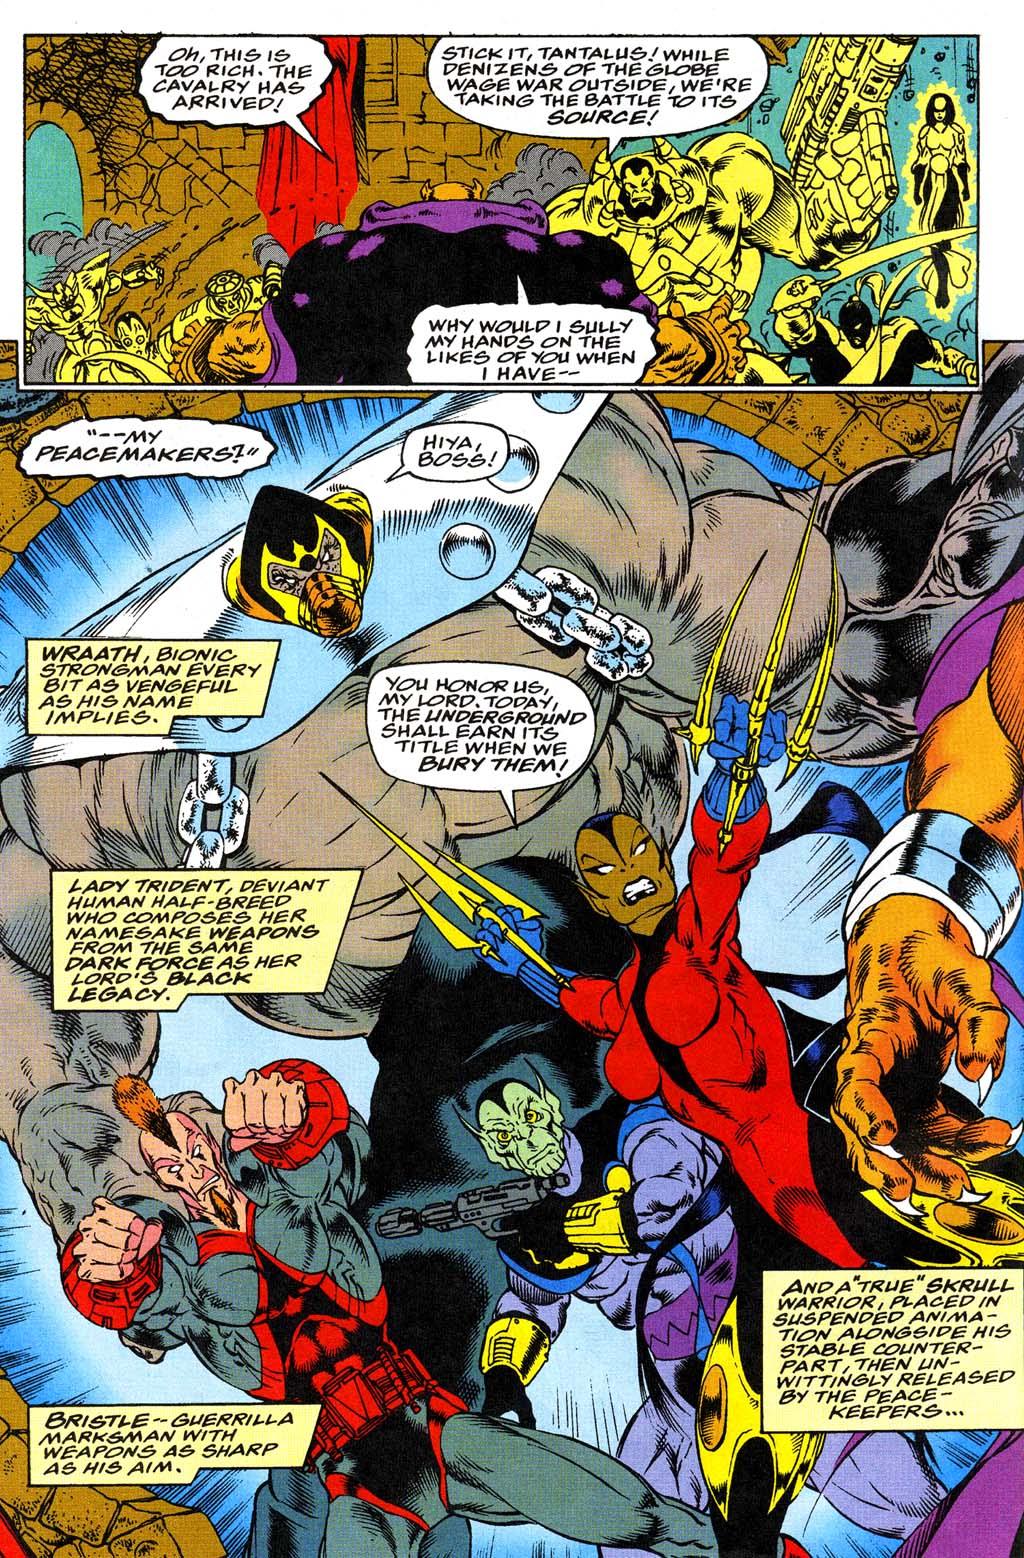 Read online Blackwulf comic -  Issue #10 - 4